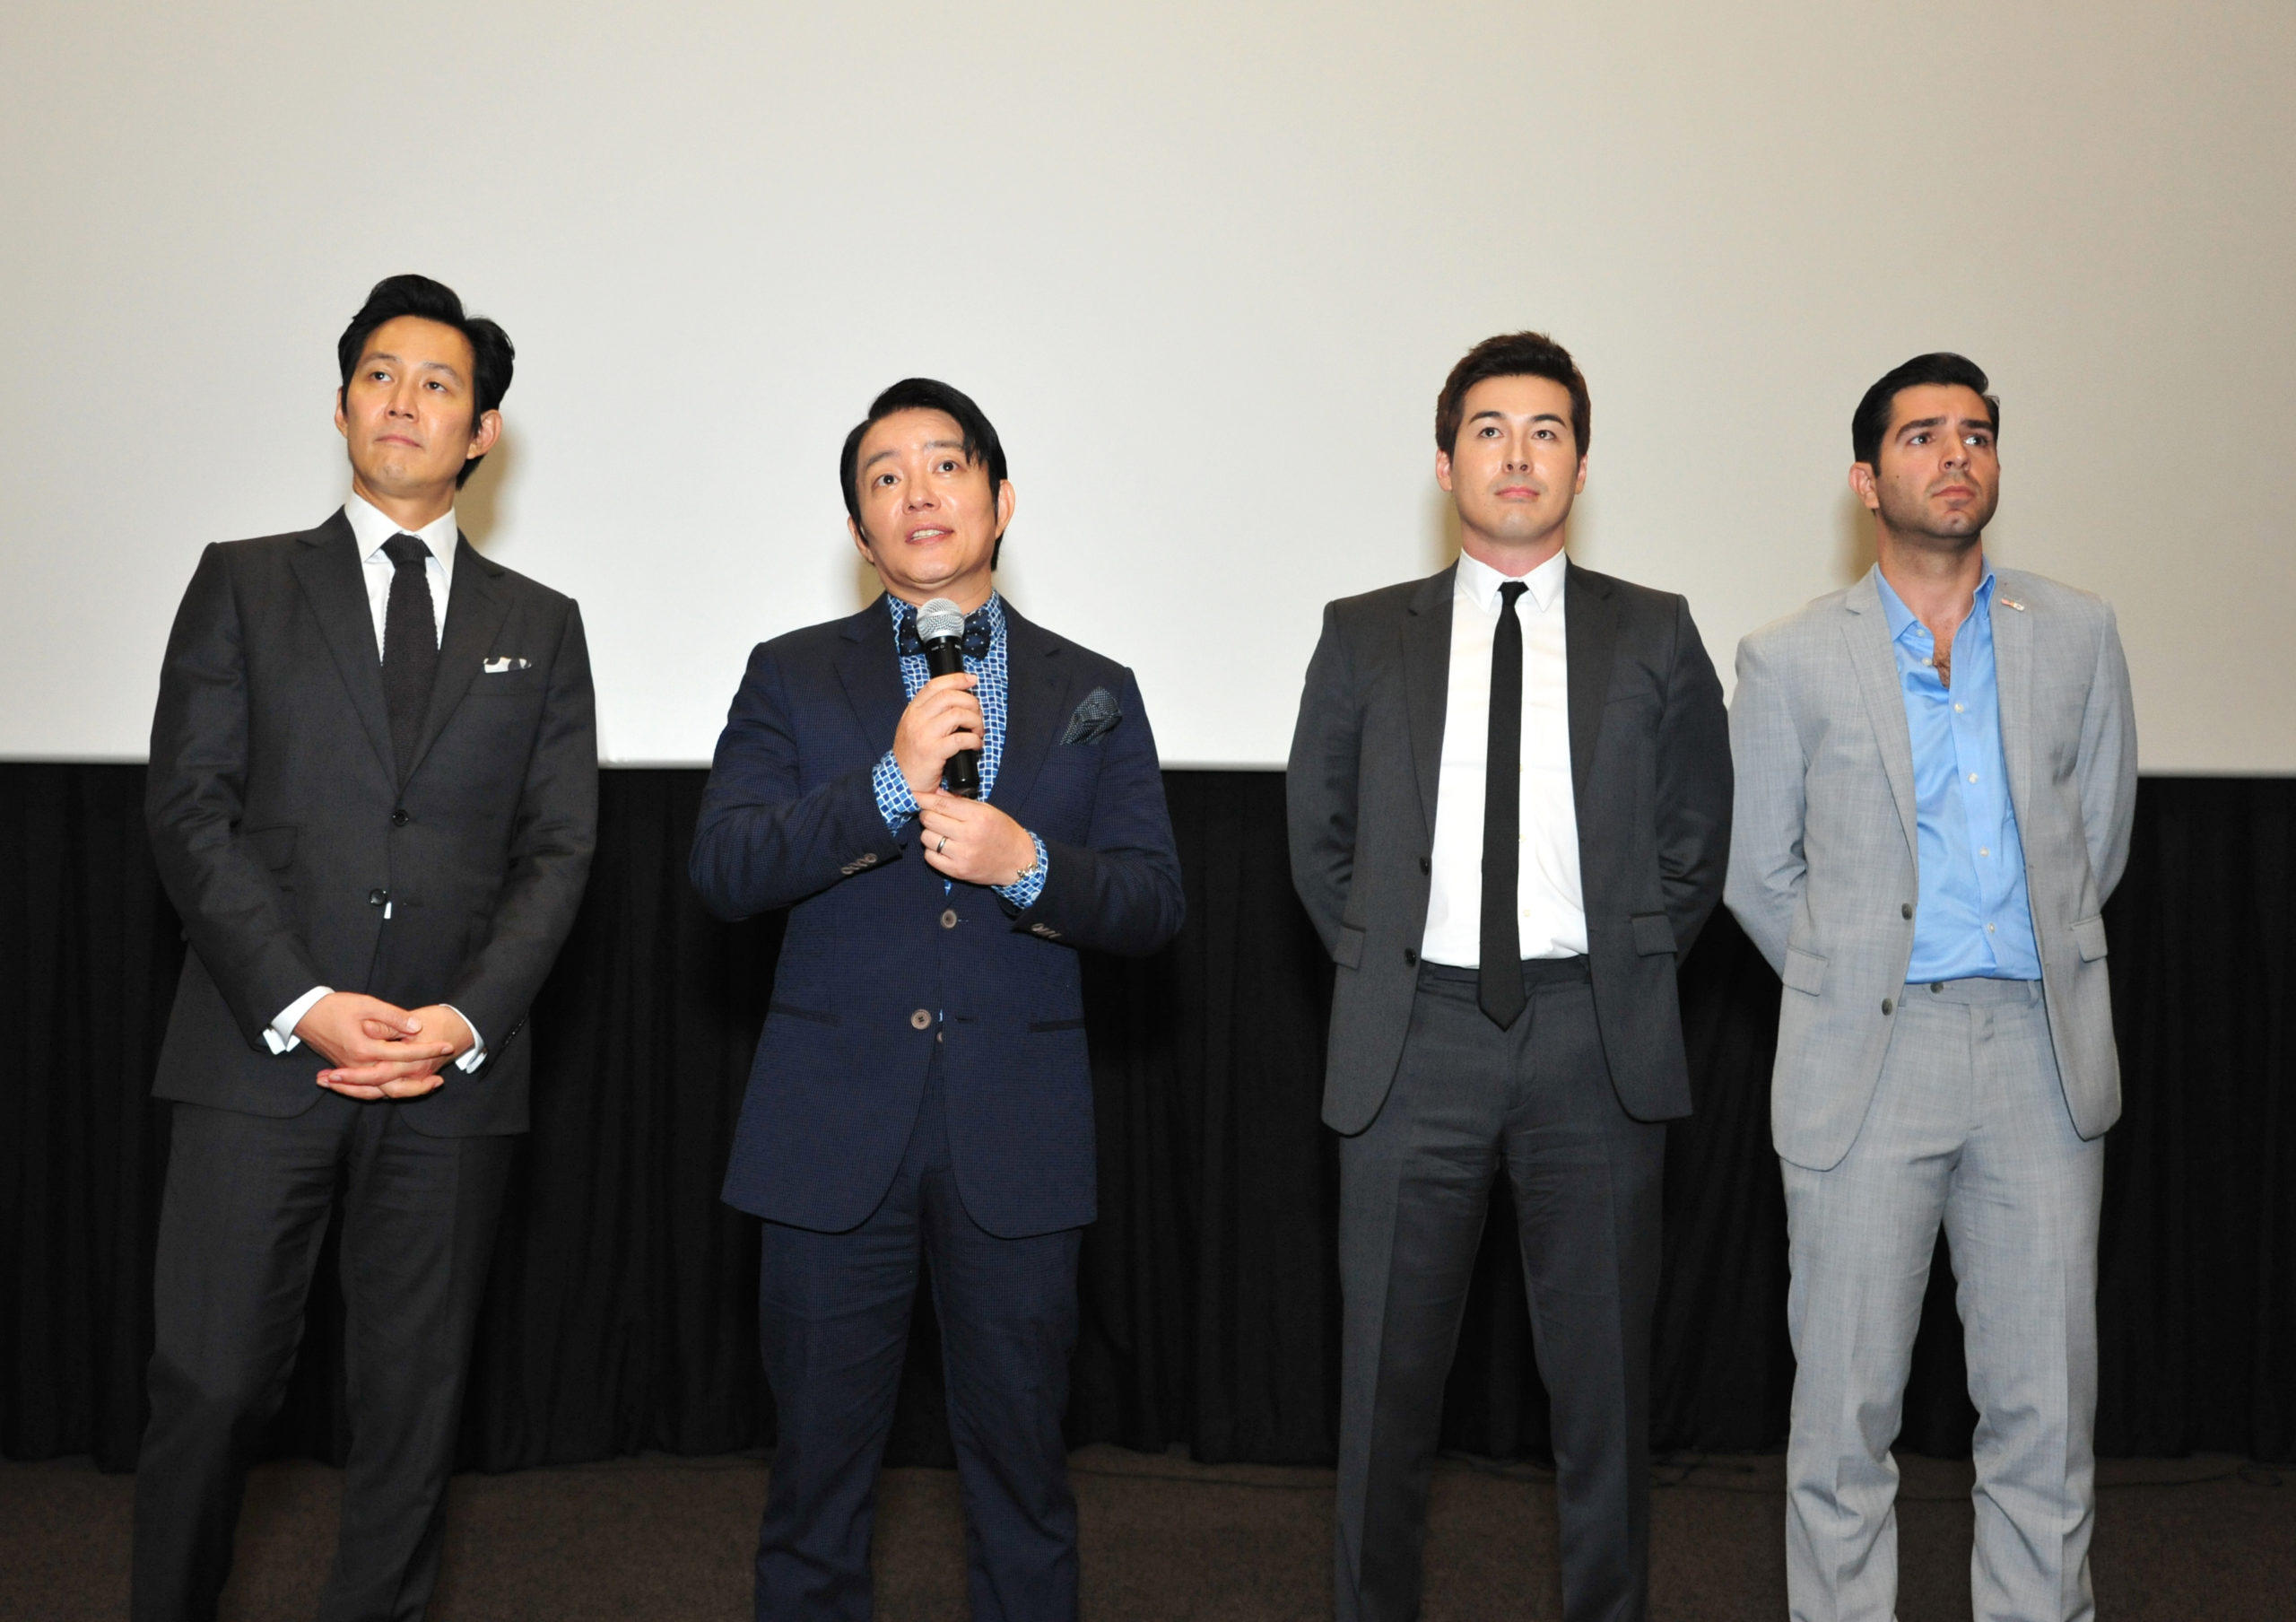 Lee Jung-jae Lee Beom-soo Sean Dulake Justin Rupple Operation Chromite Screening